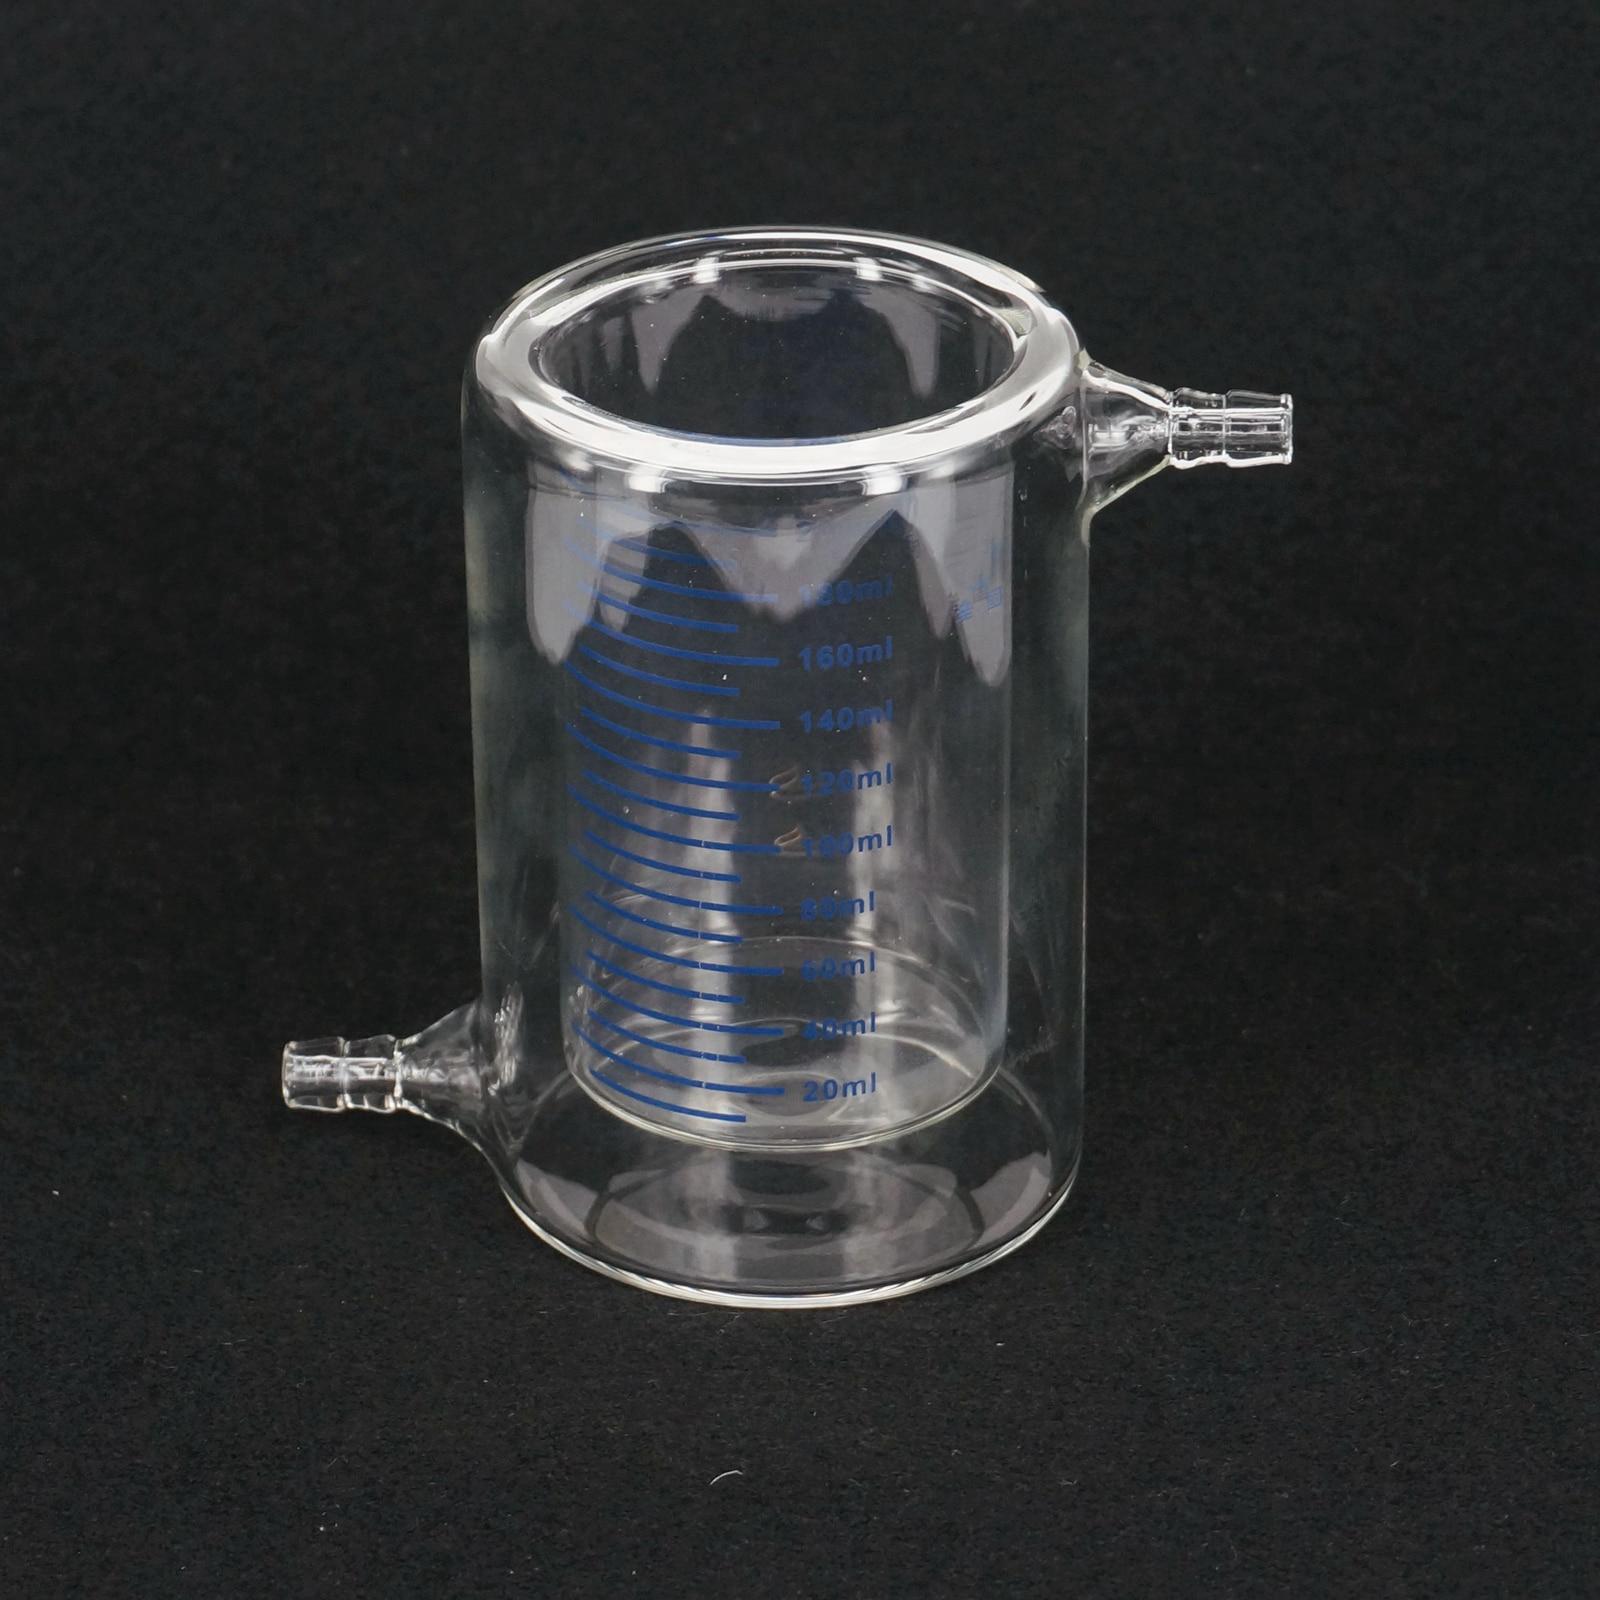 200ml Laboratory Jacketed Borosilicate Glass Beaker Double Layer Beaker for Photocatalytic Experiment 200ml ptfe beaker teflon beaker no handle chemical labware